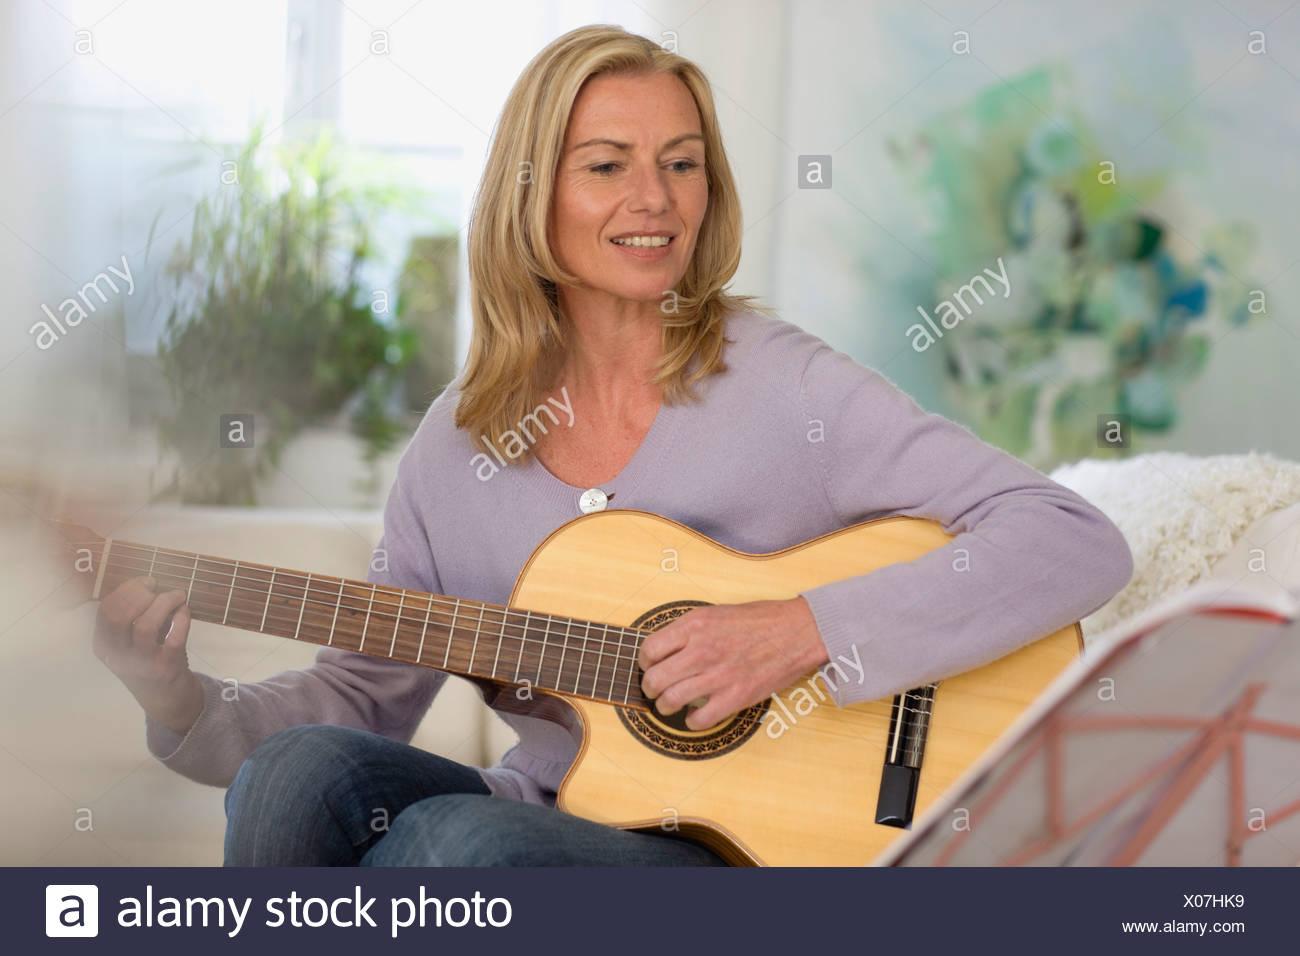 Woman playing guitar - Stock Image